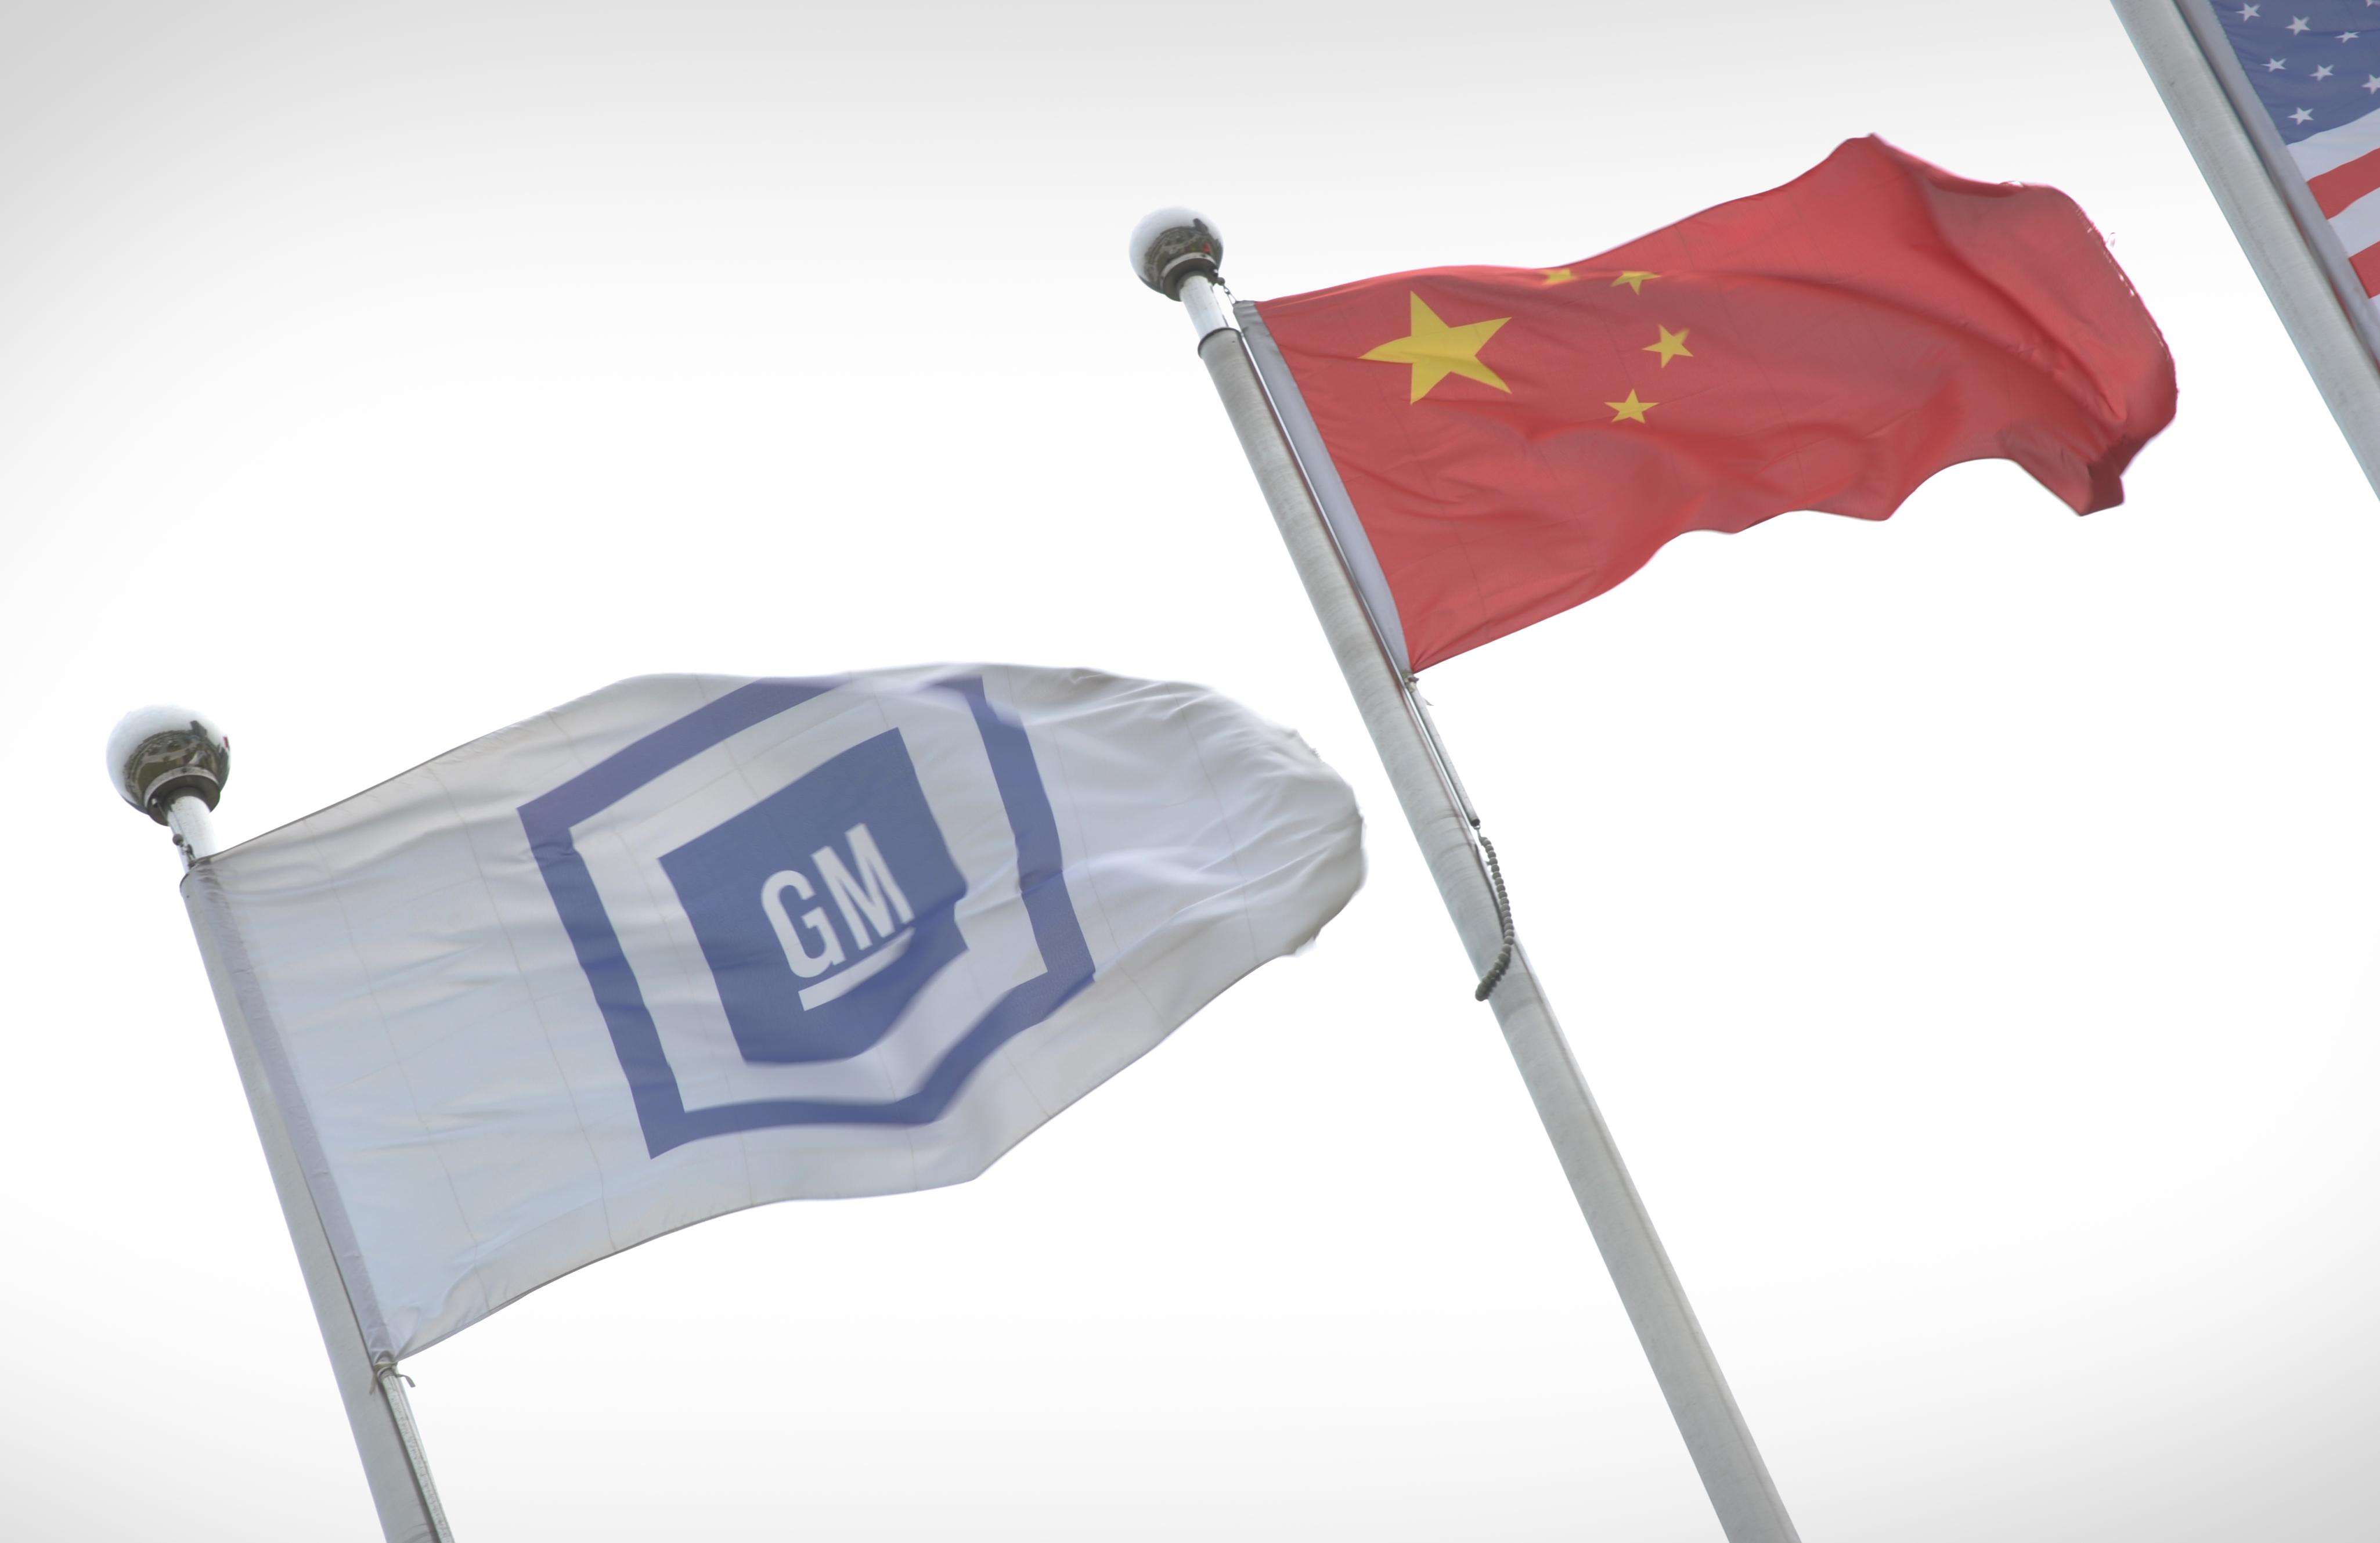 CHINA-AUTO-SHOW-COMPANY-GM